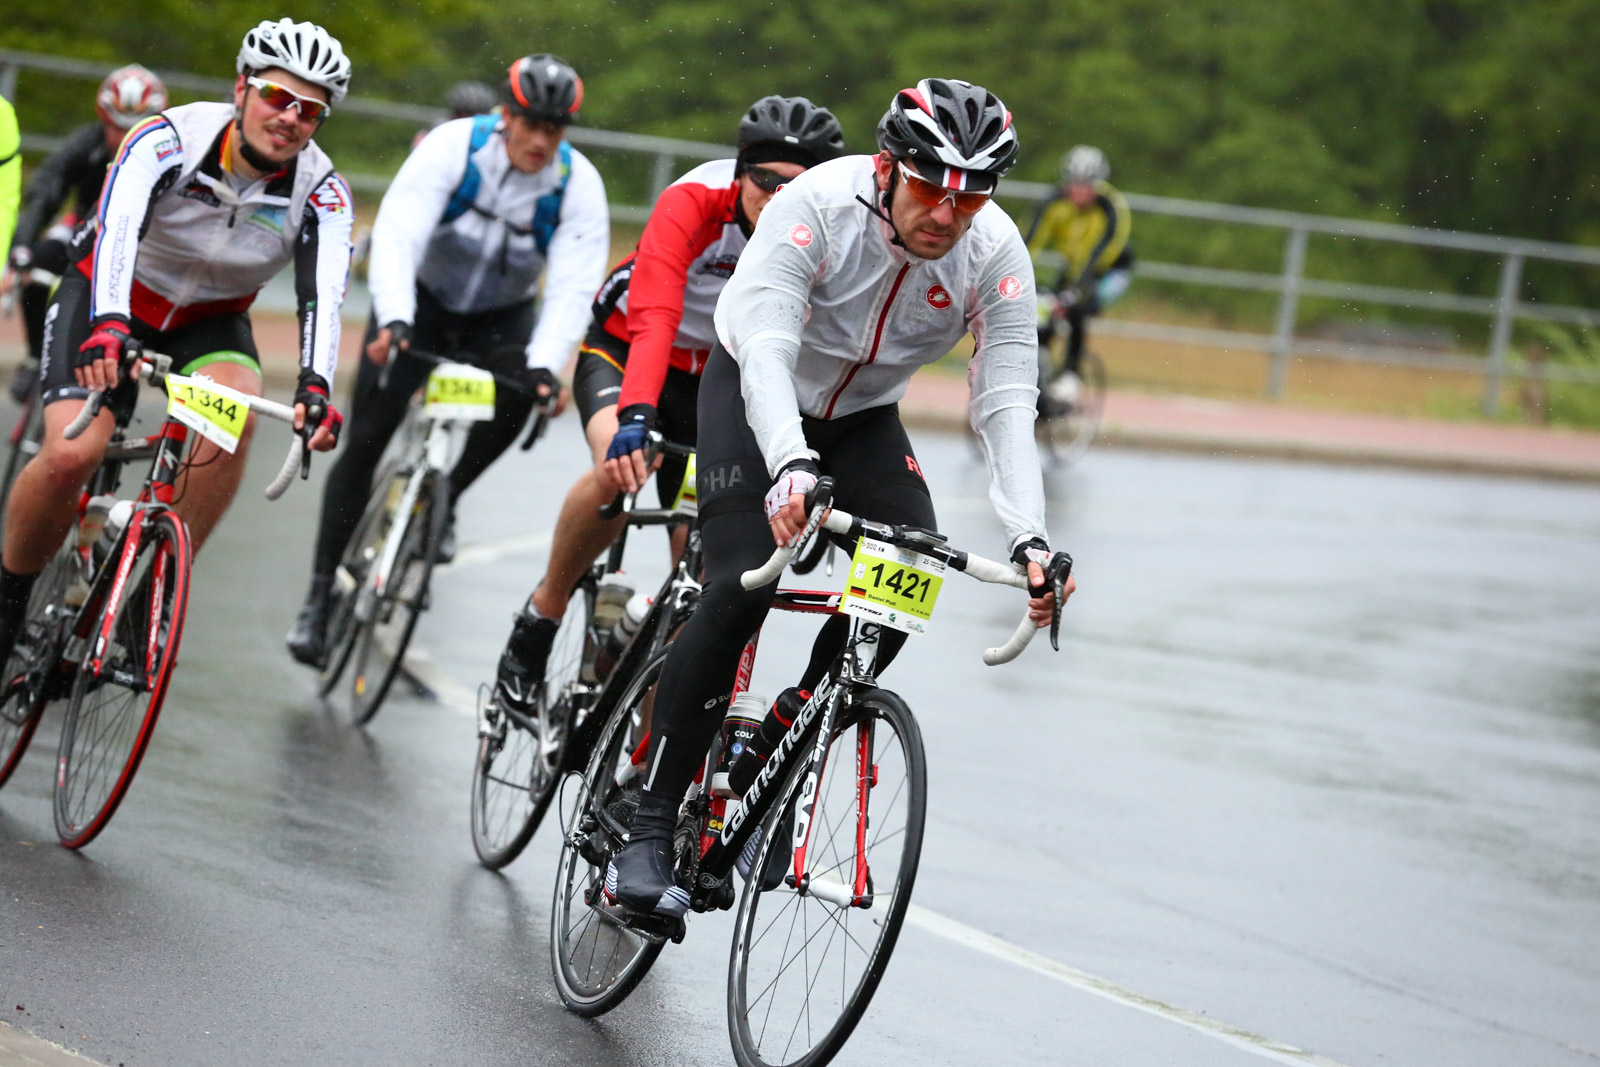 Wetter, kalt, Regen, MSR300, Sportograf